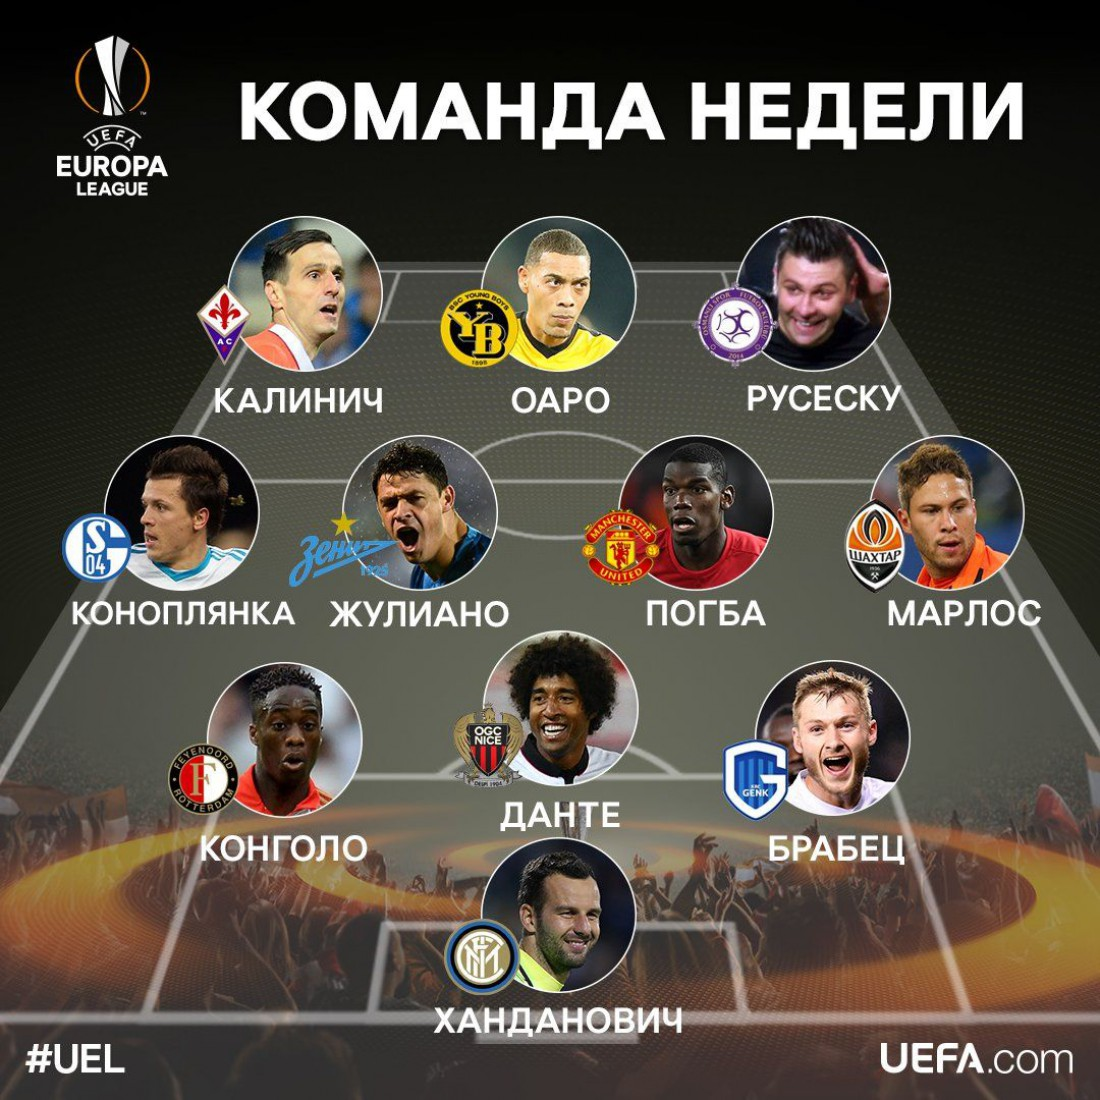 Команда недели 3-го тура Лиги Европы